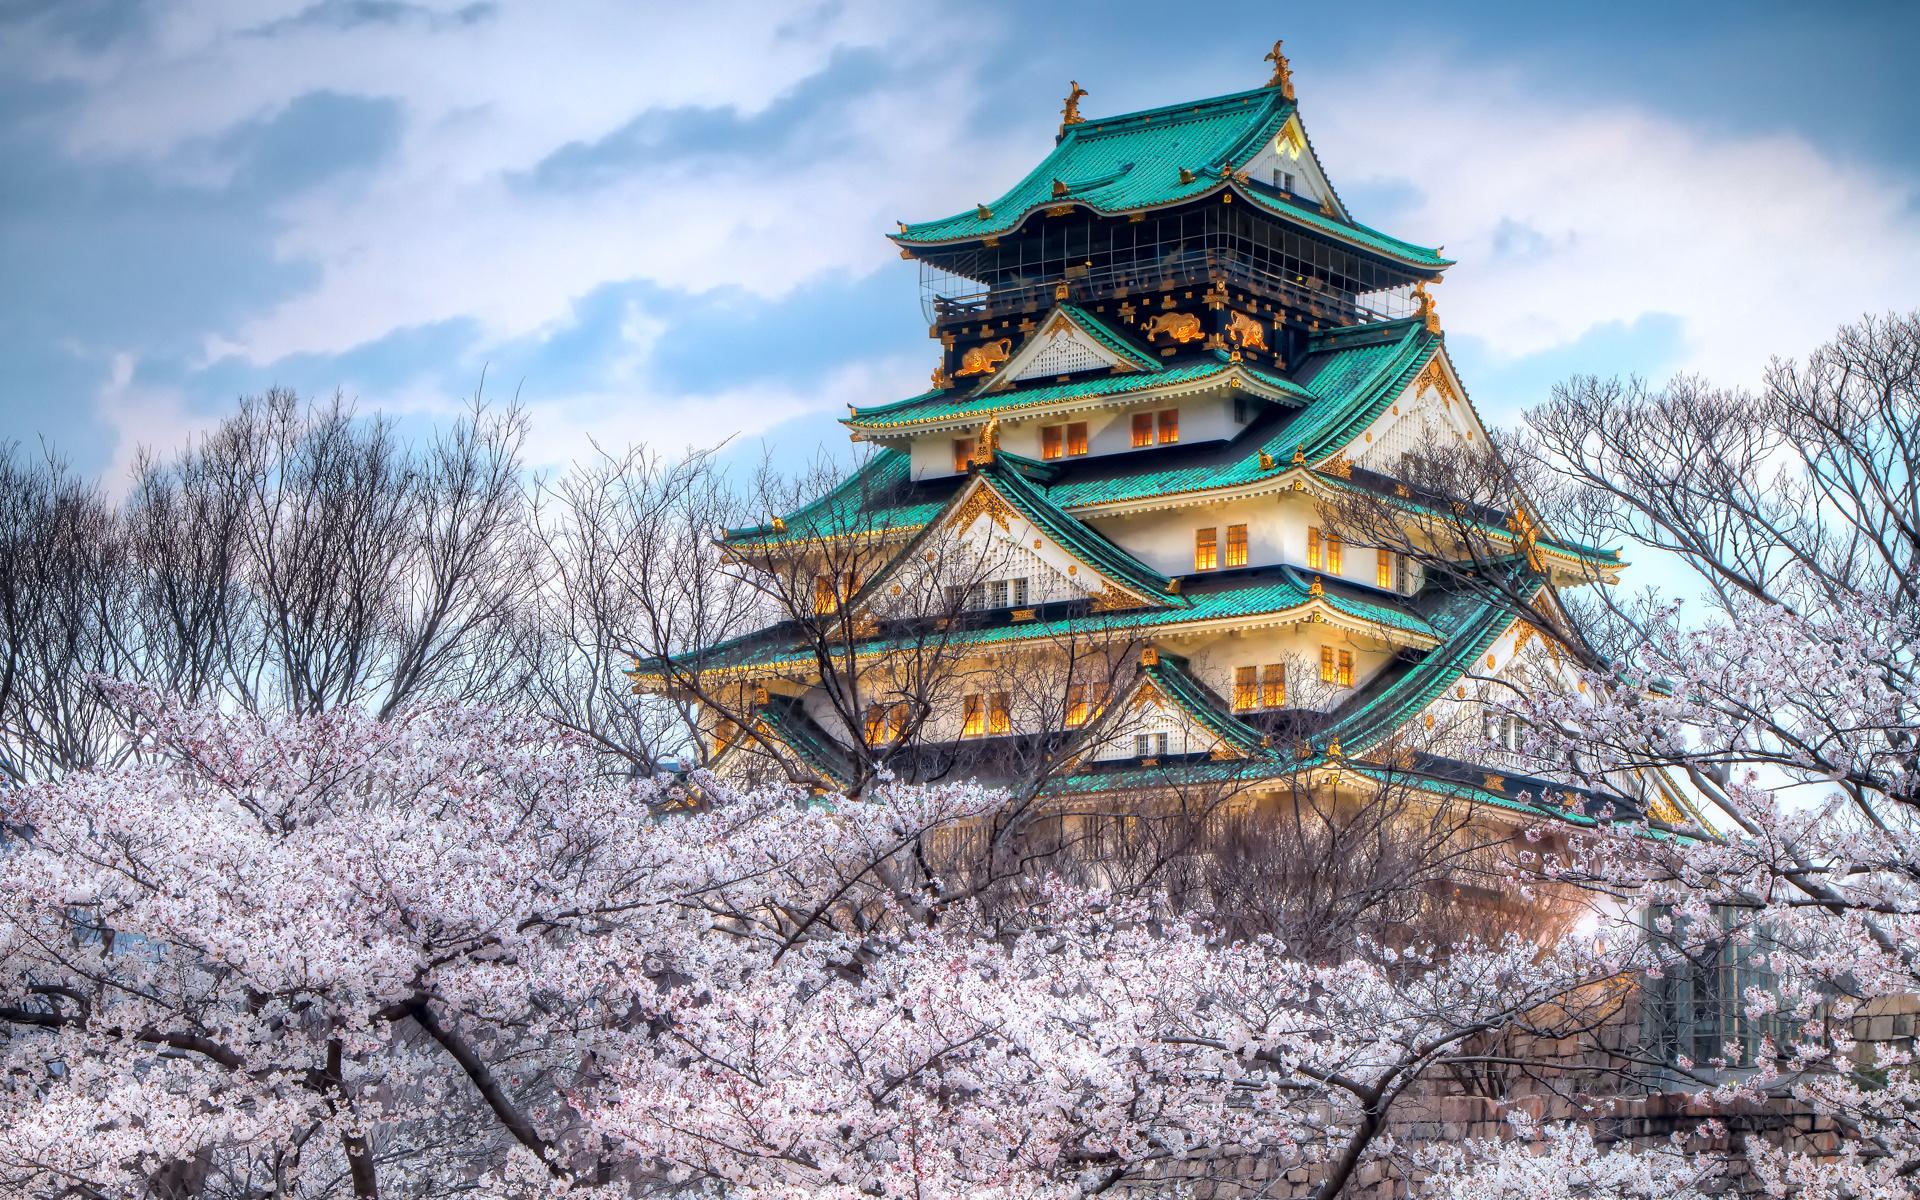 картинка пагода и сакура исполнилось восемь лет